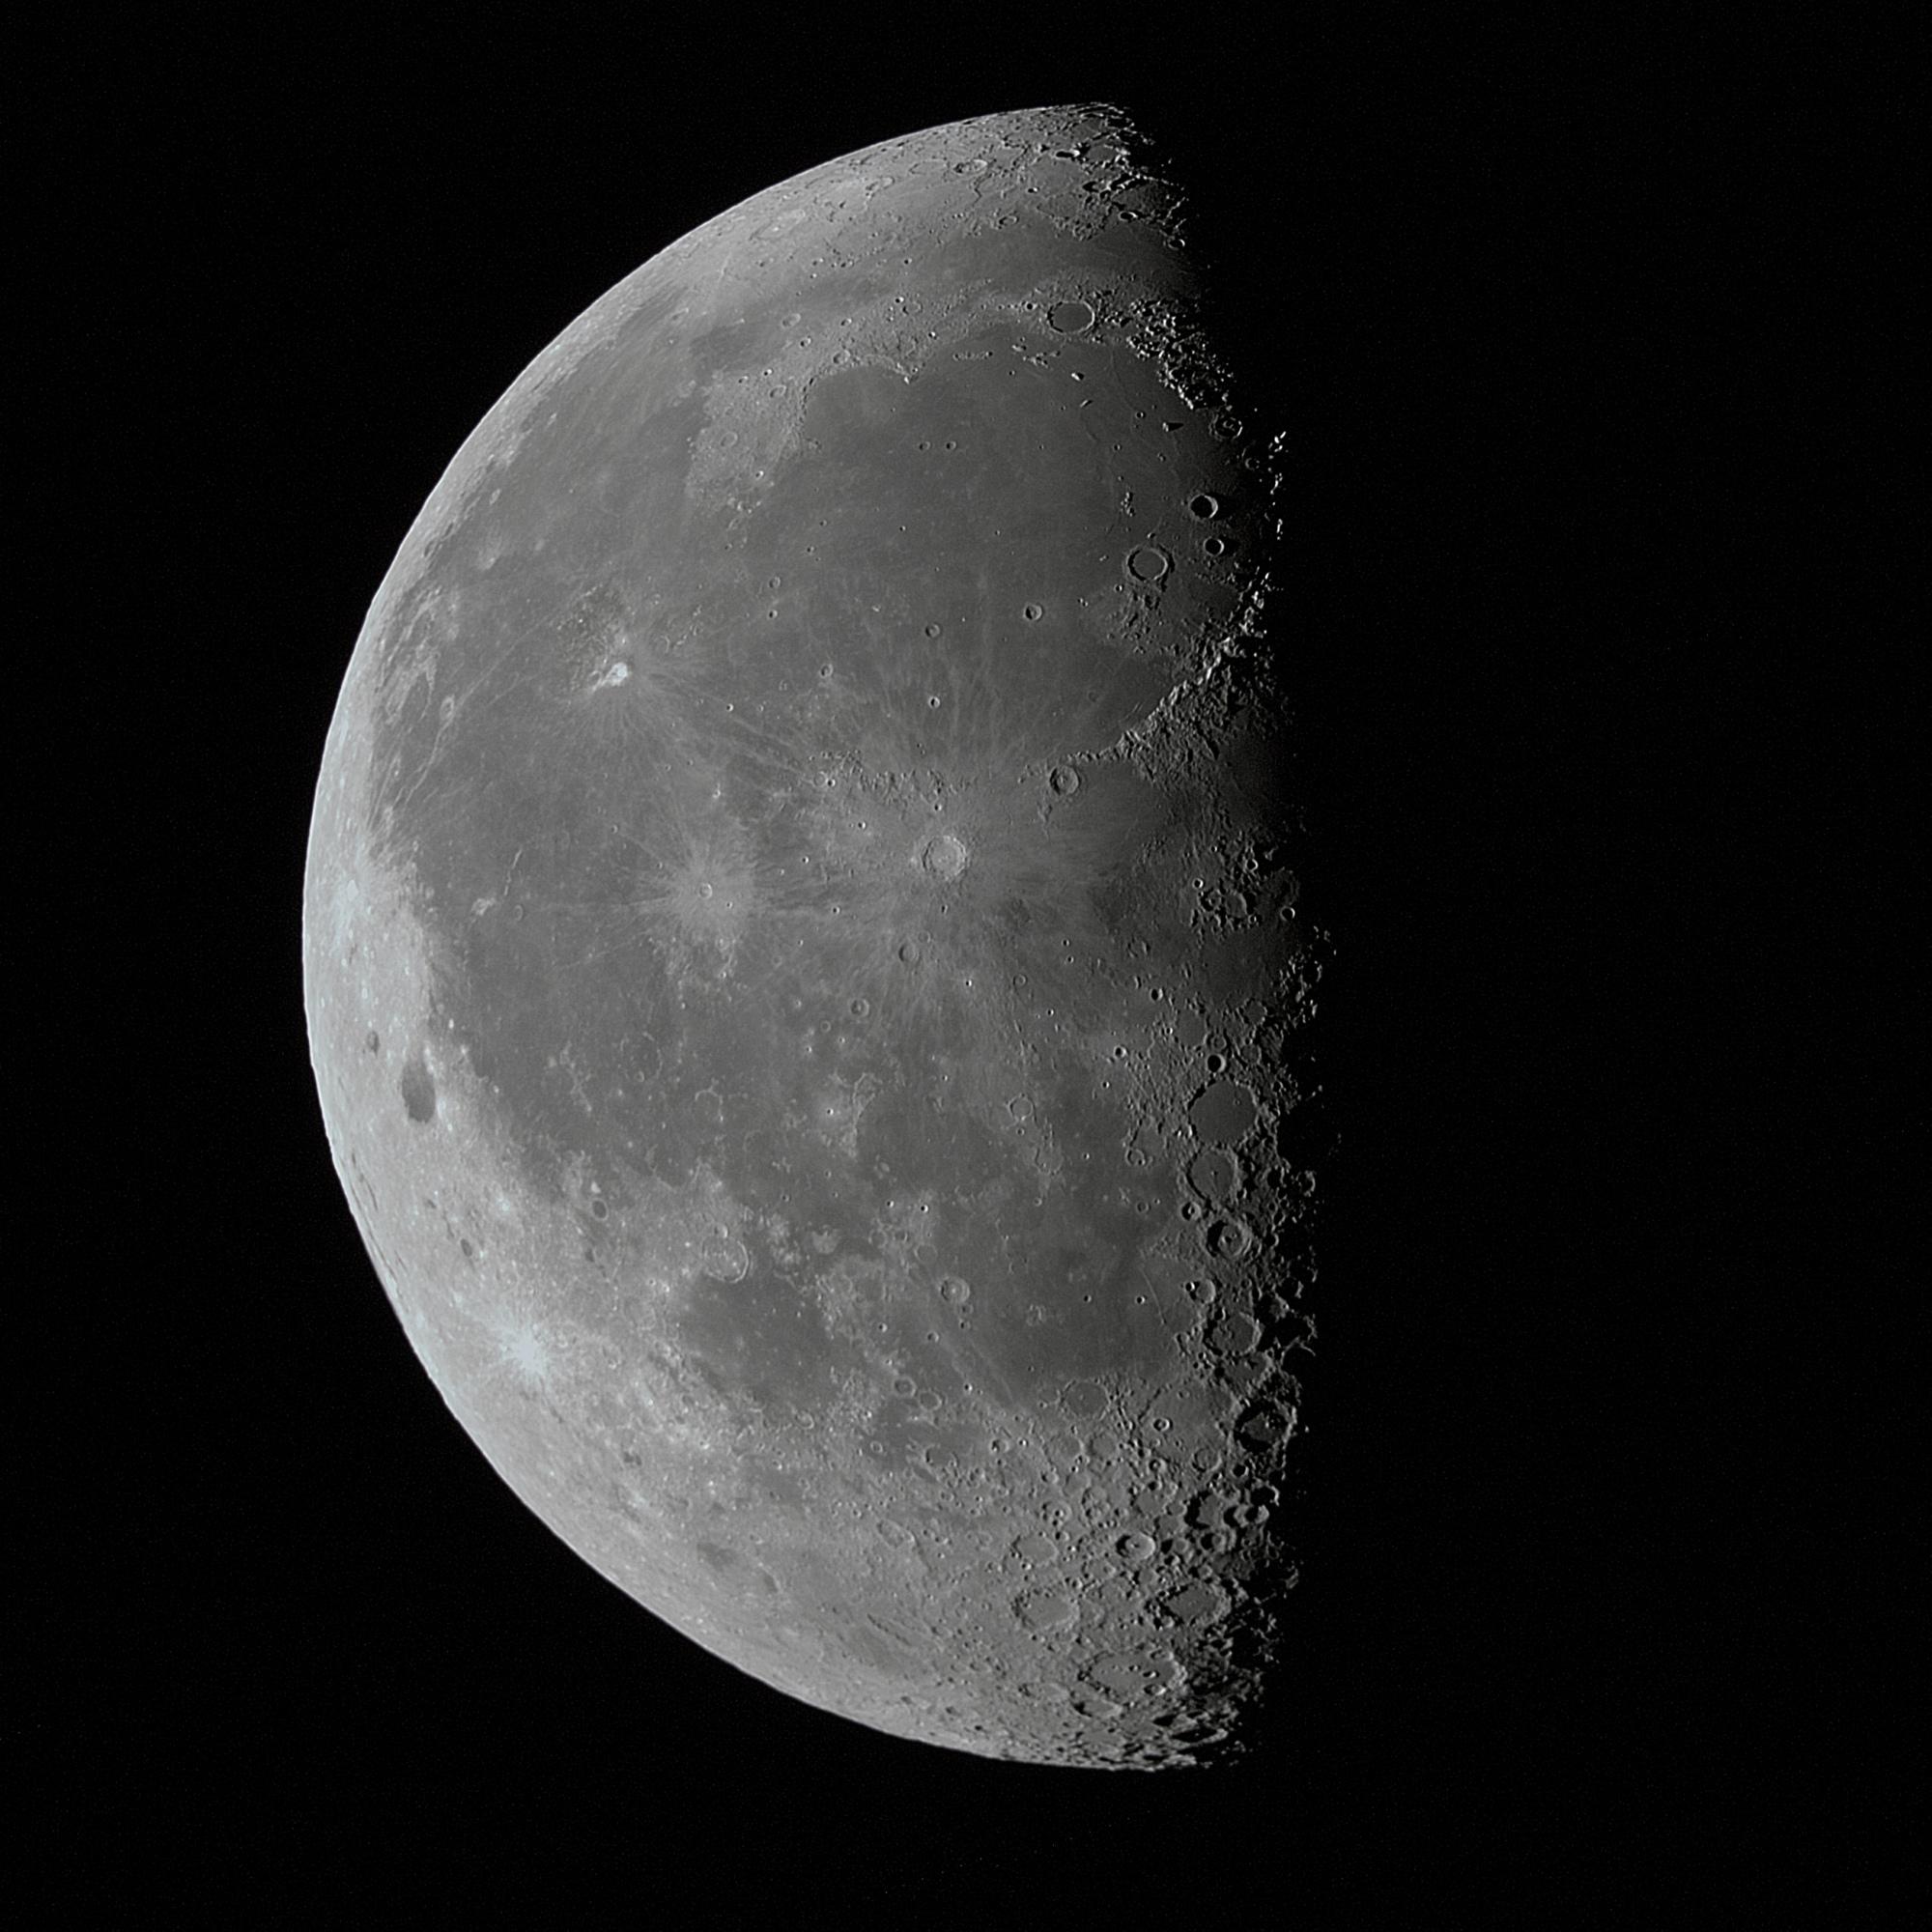 Lune.thumb.jpg.3ce0d3b2cdfb6a17d77211ef9c94b00e.jpg